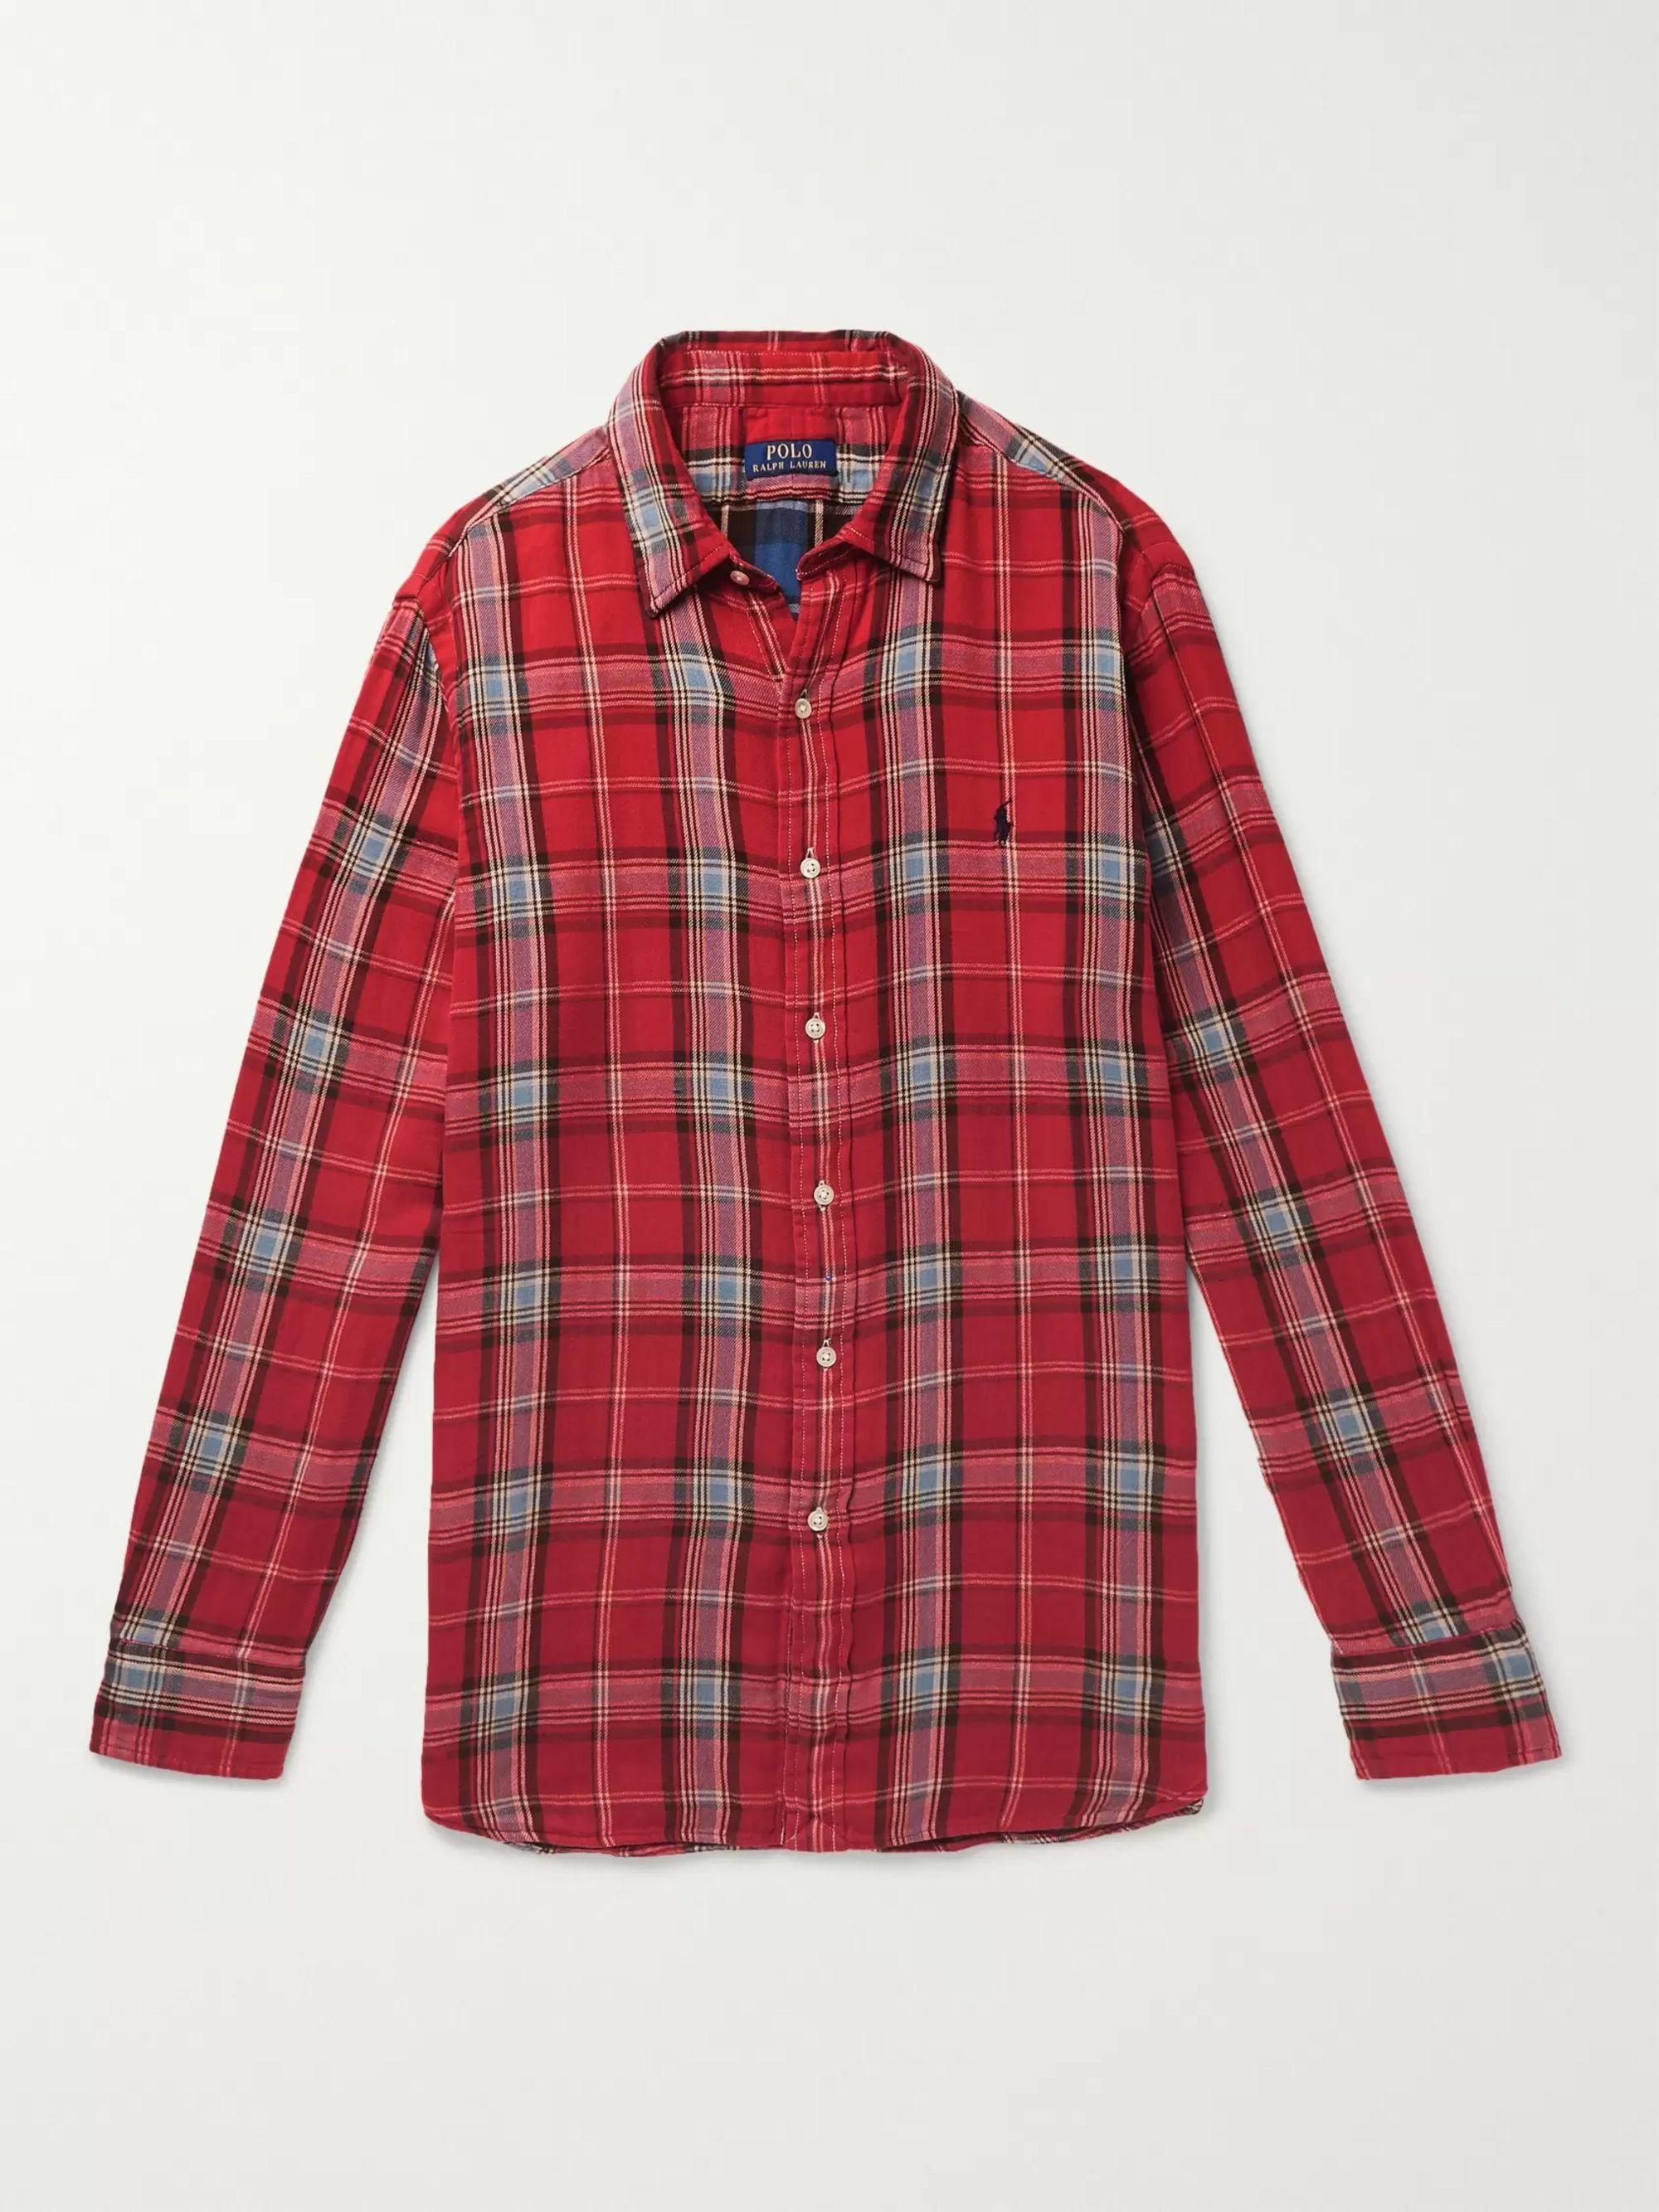 6f6cc1e3 Double-Faced Checked Cotton-Flannel Shirt